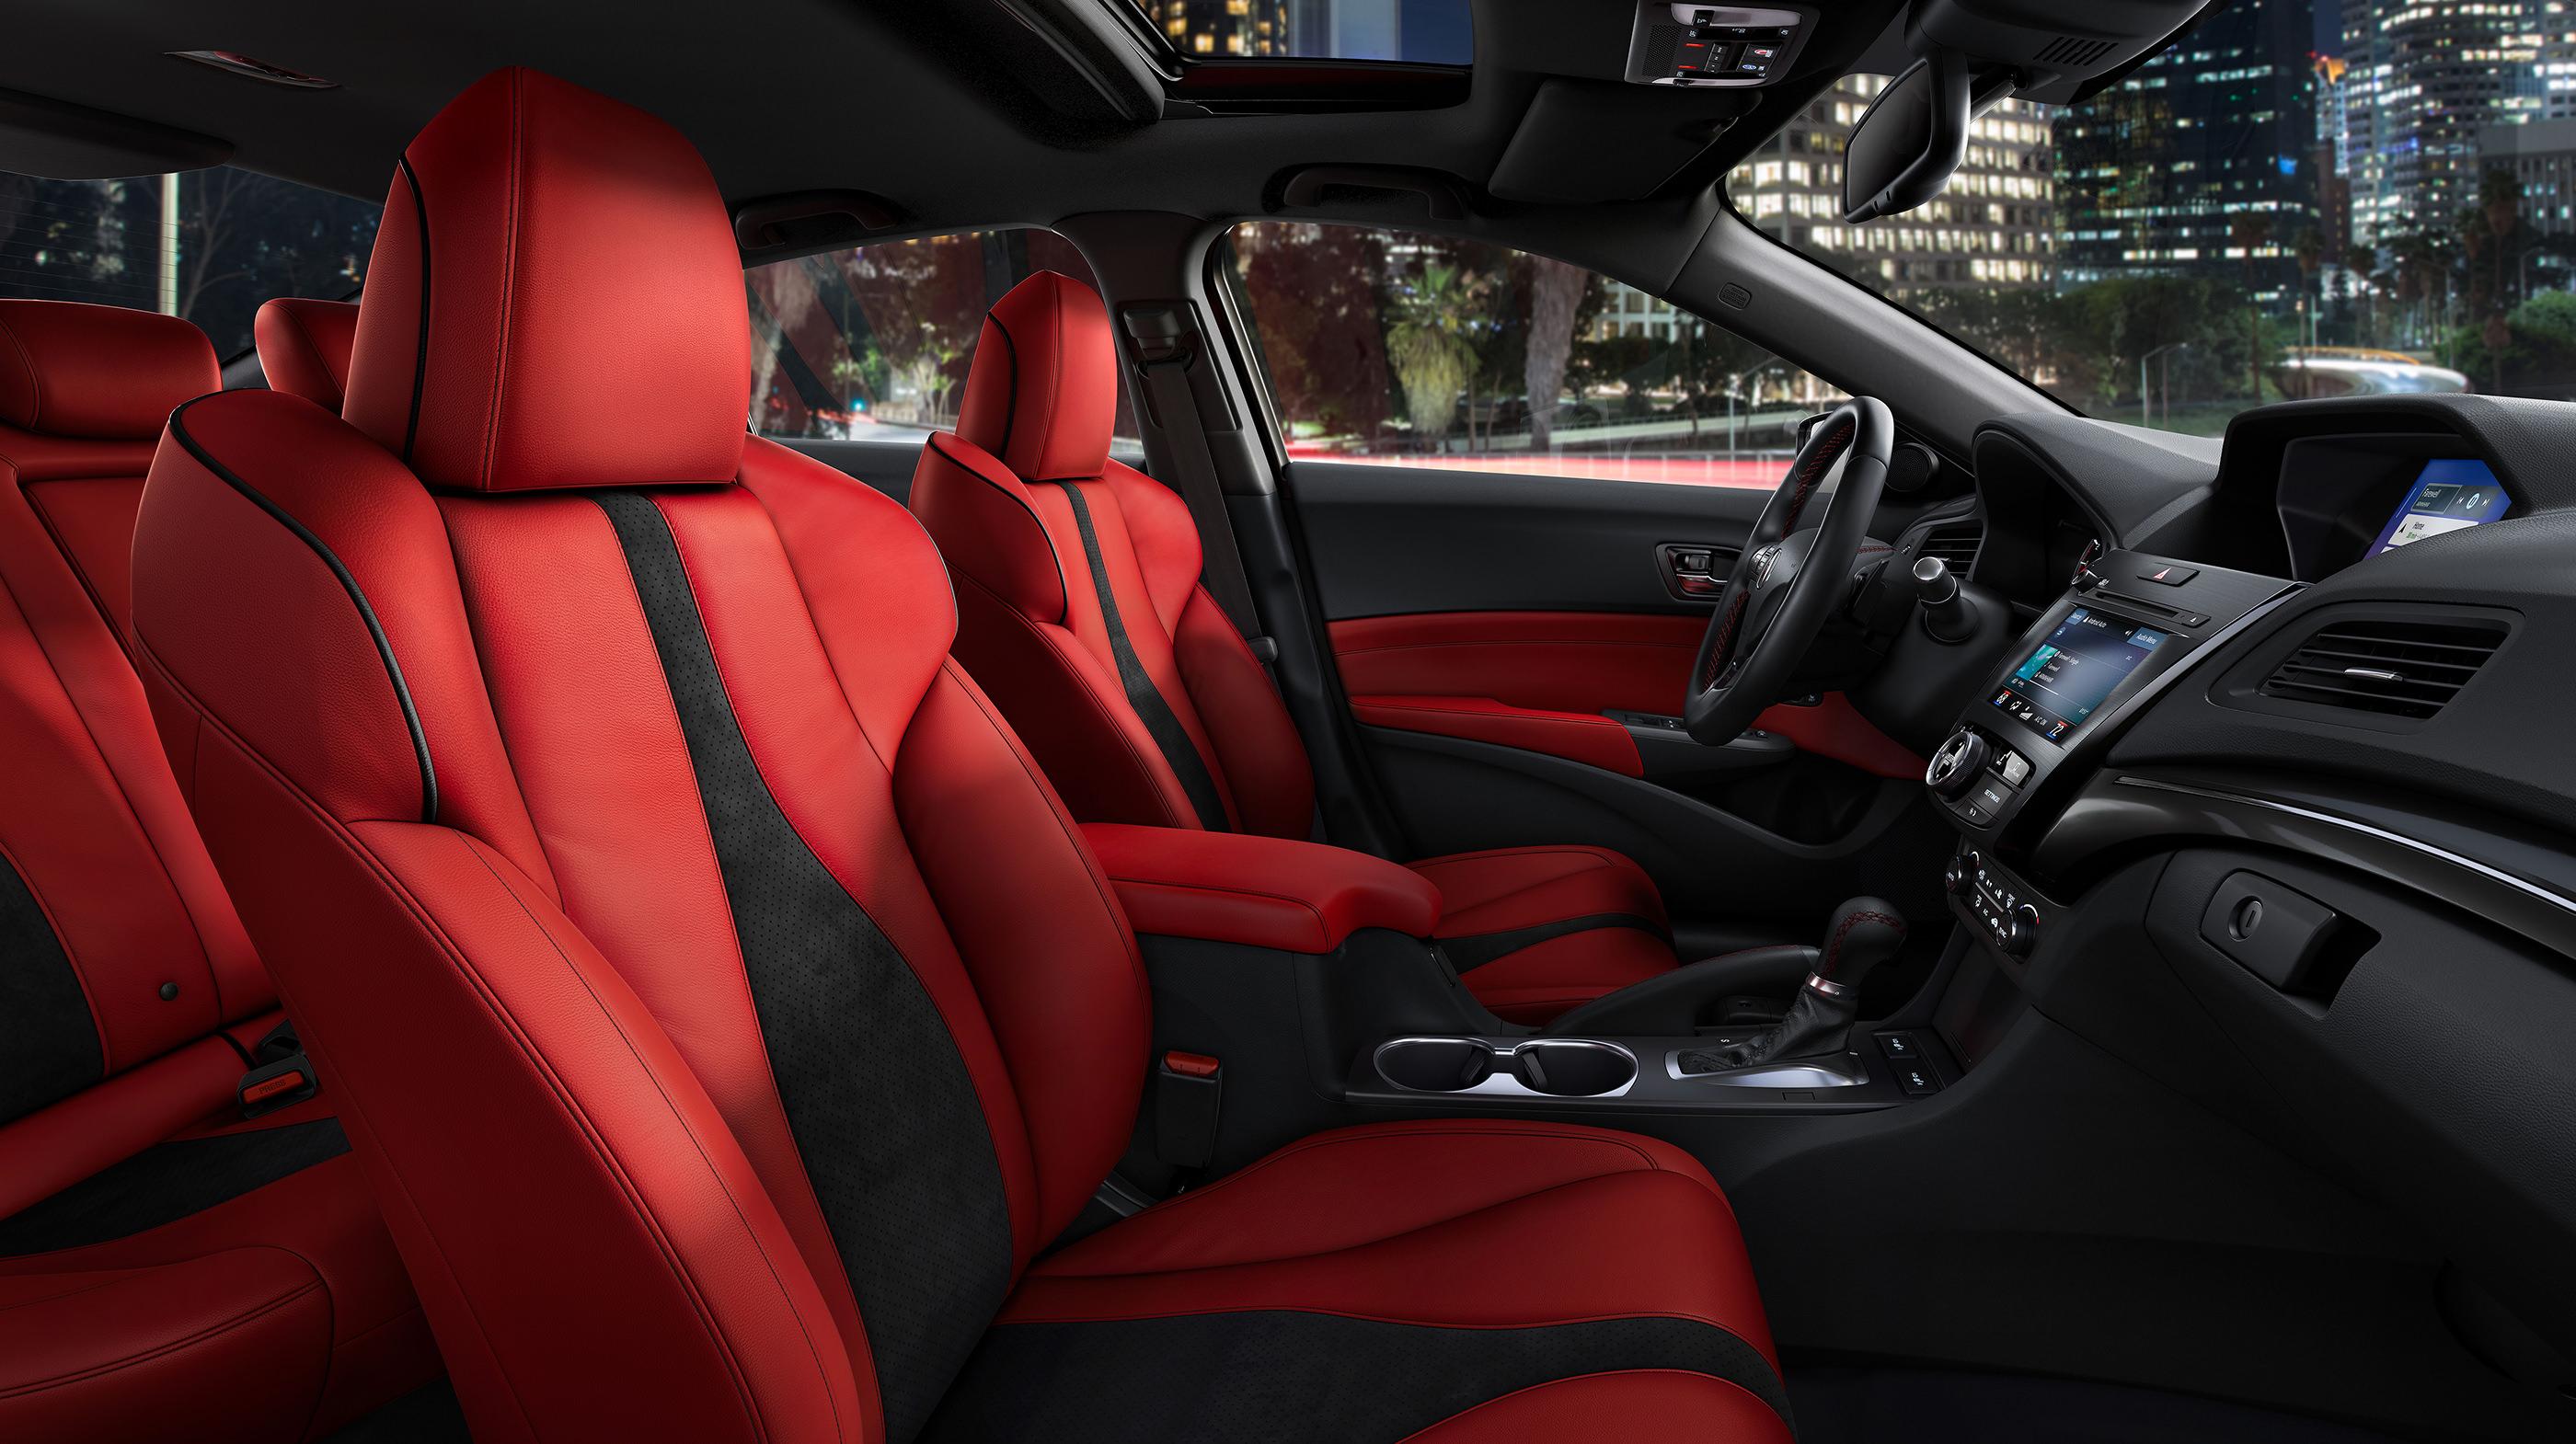 2019 Acura ILX Cockpit